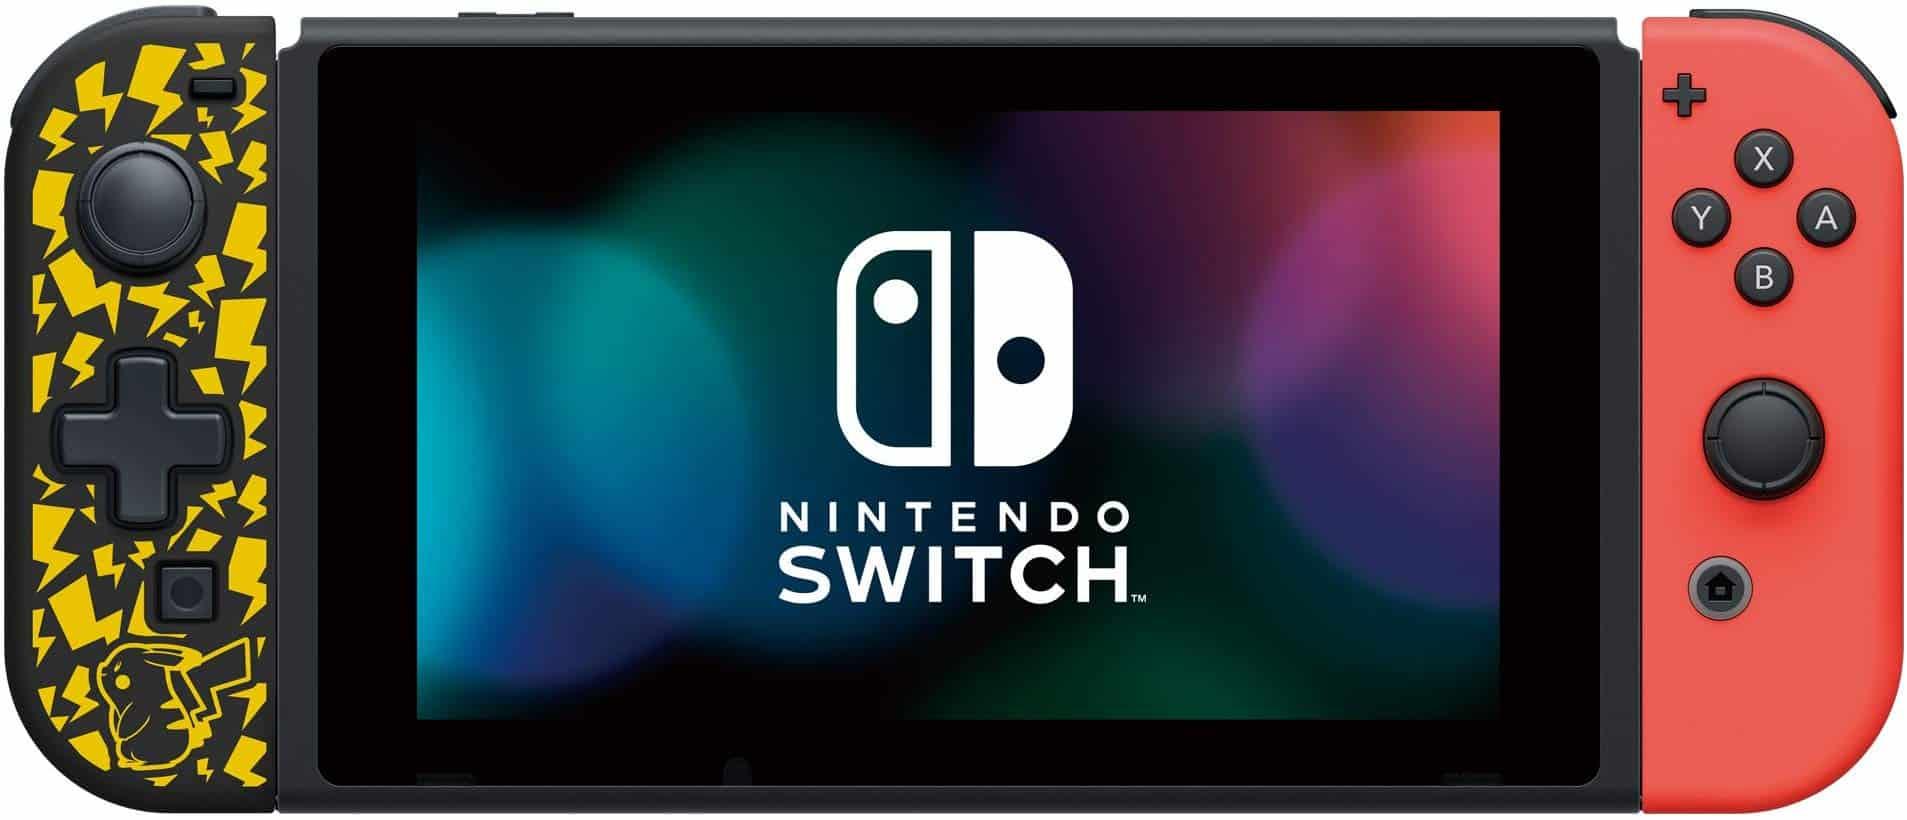 Nintendo Switch DPad Pikachu